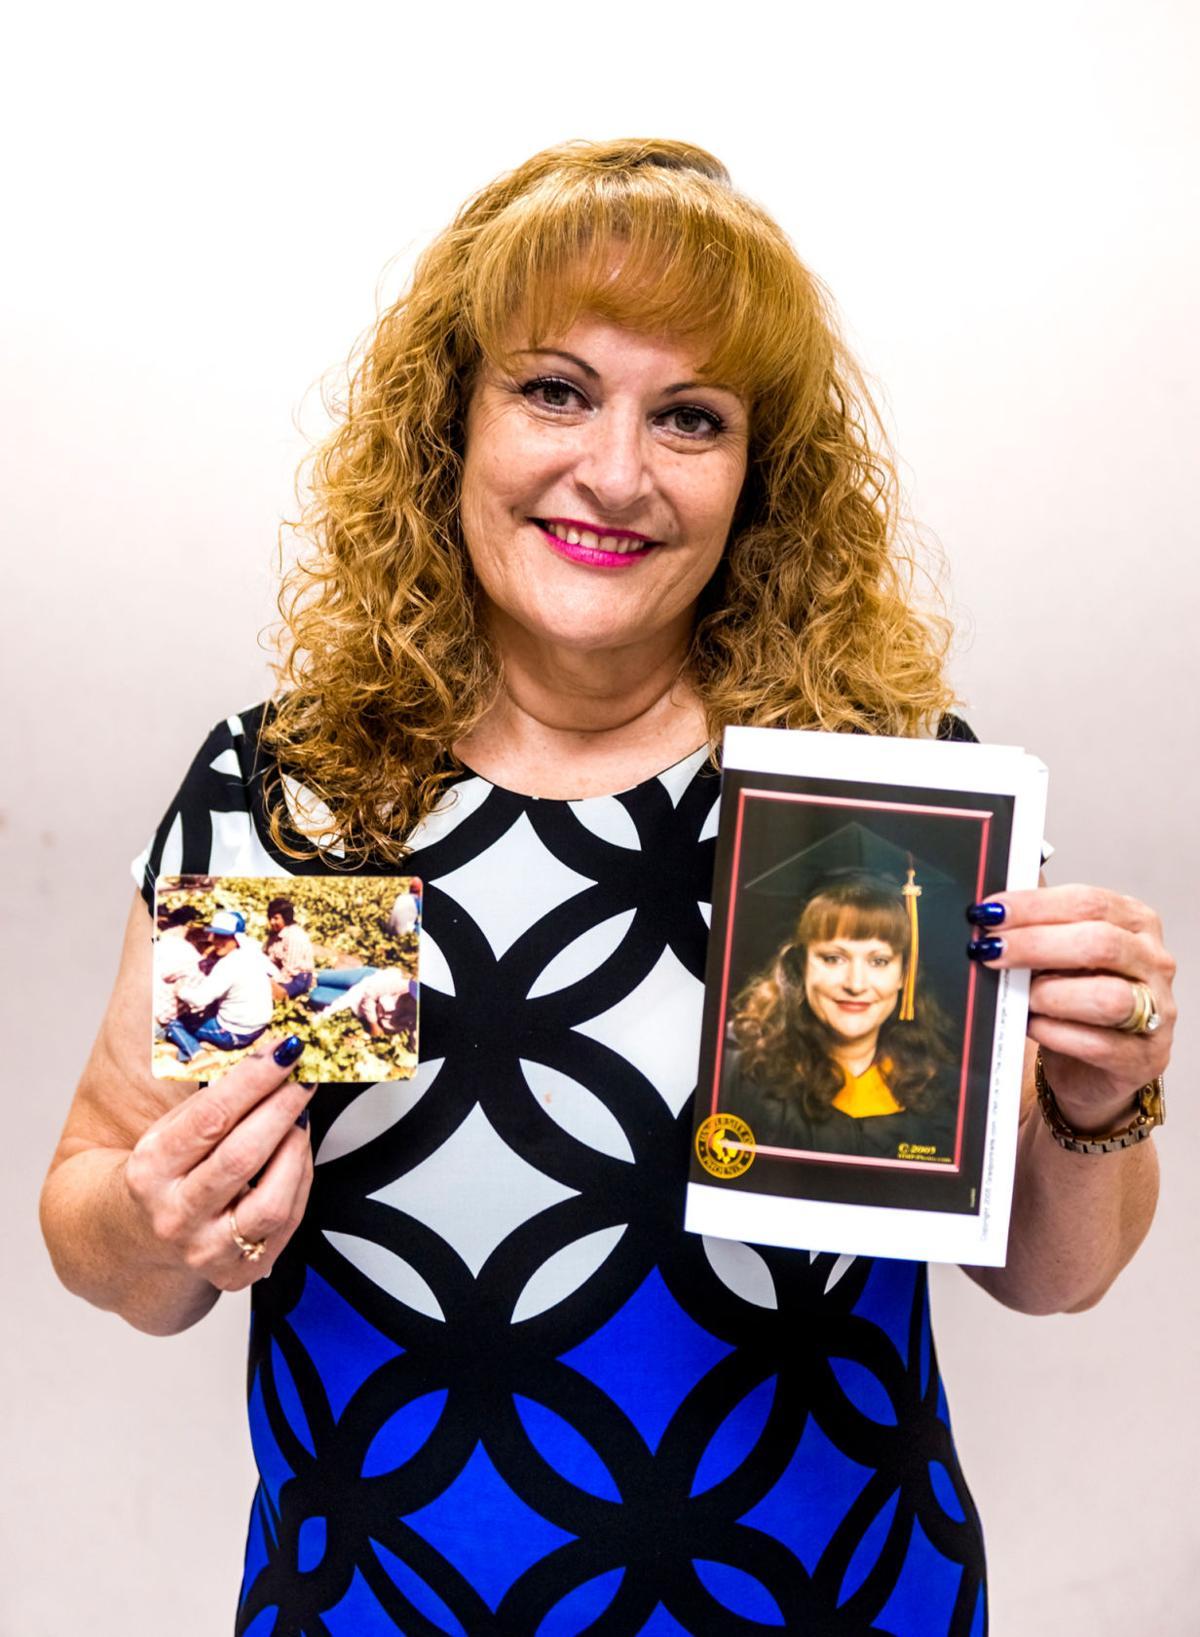 Graciela Palacios: From field worker to ICU nurse